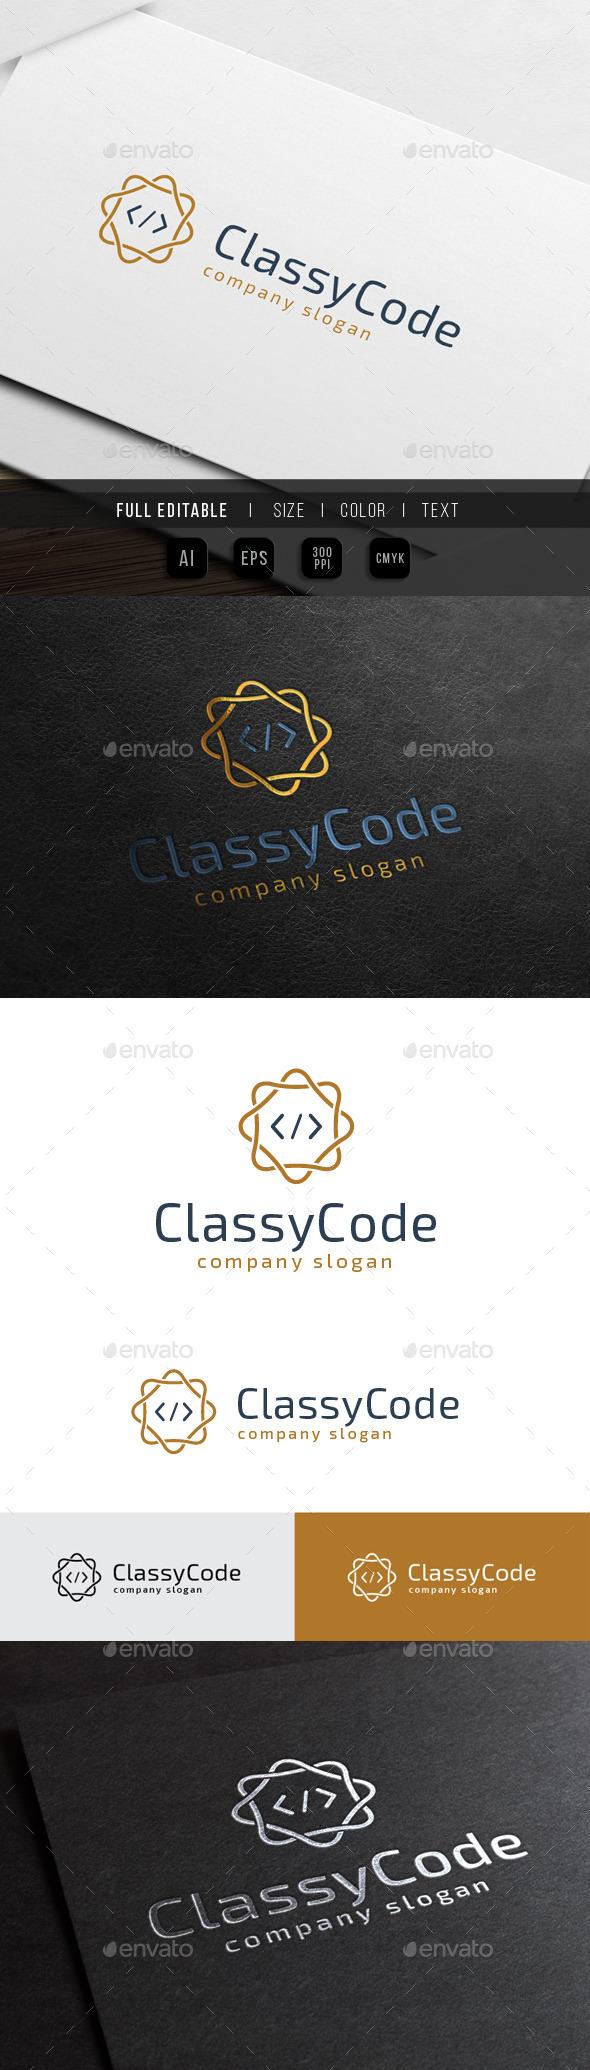 GraphicRiver Premium Classy Code 10472177